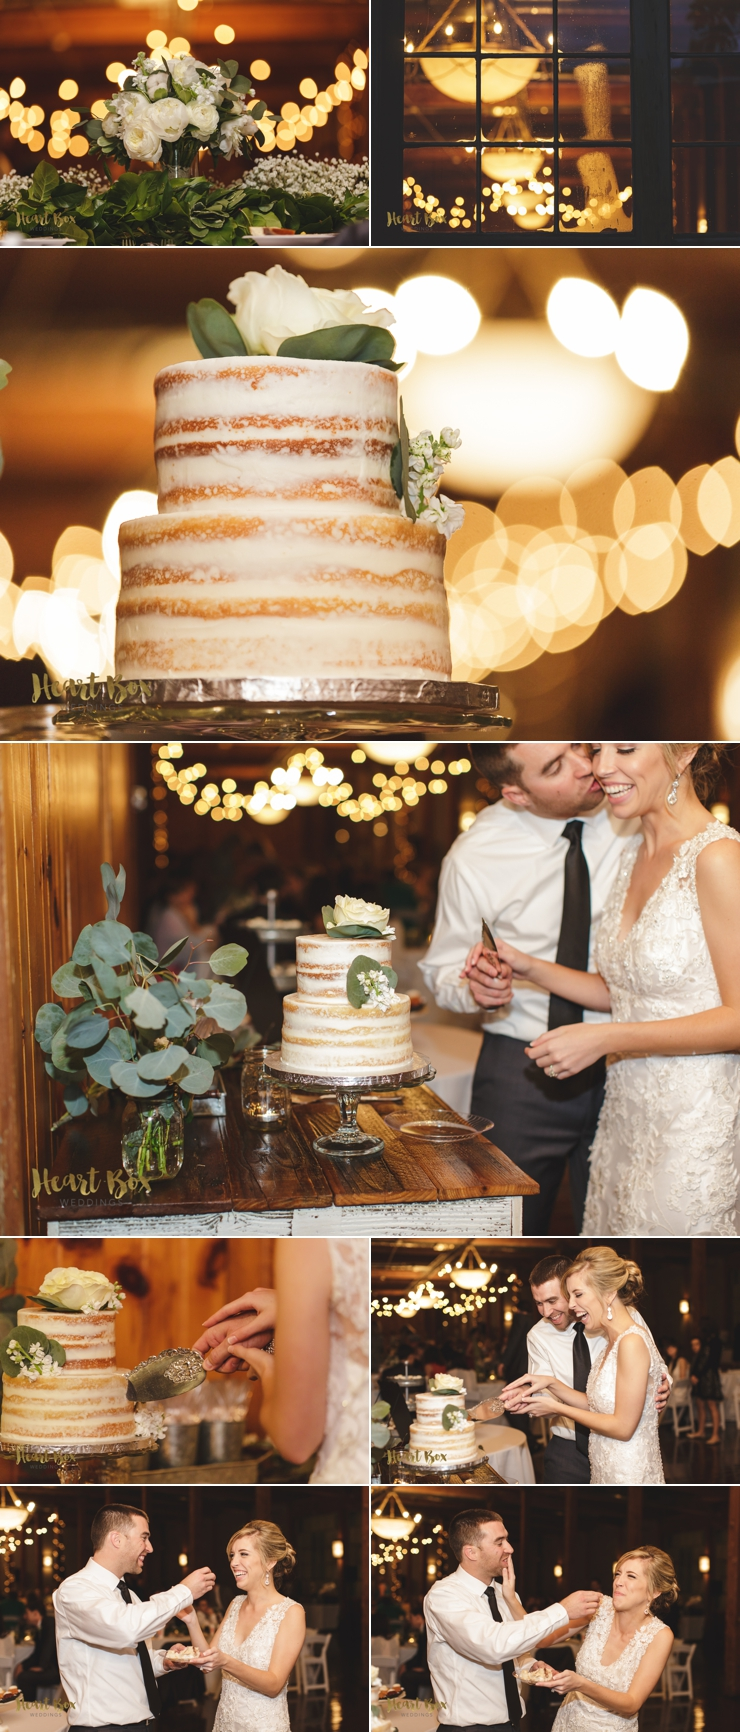 Popplewell Wedding Blog Collages 24.jpg